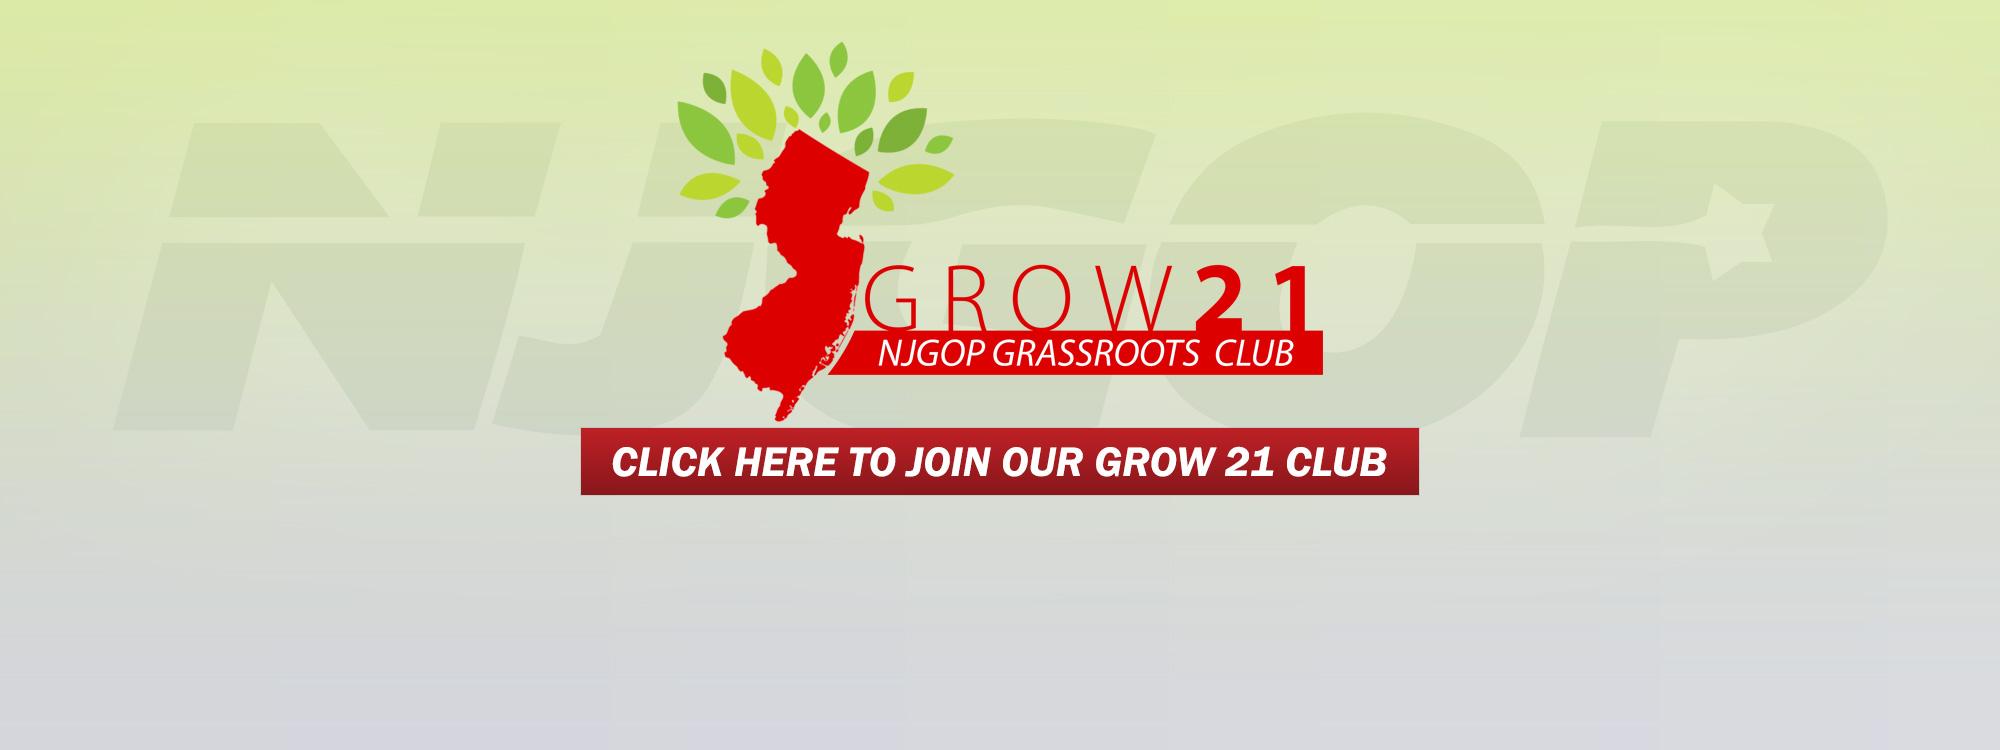 Grow 21 Club